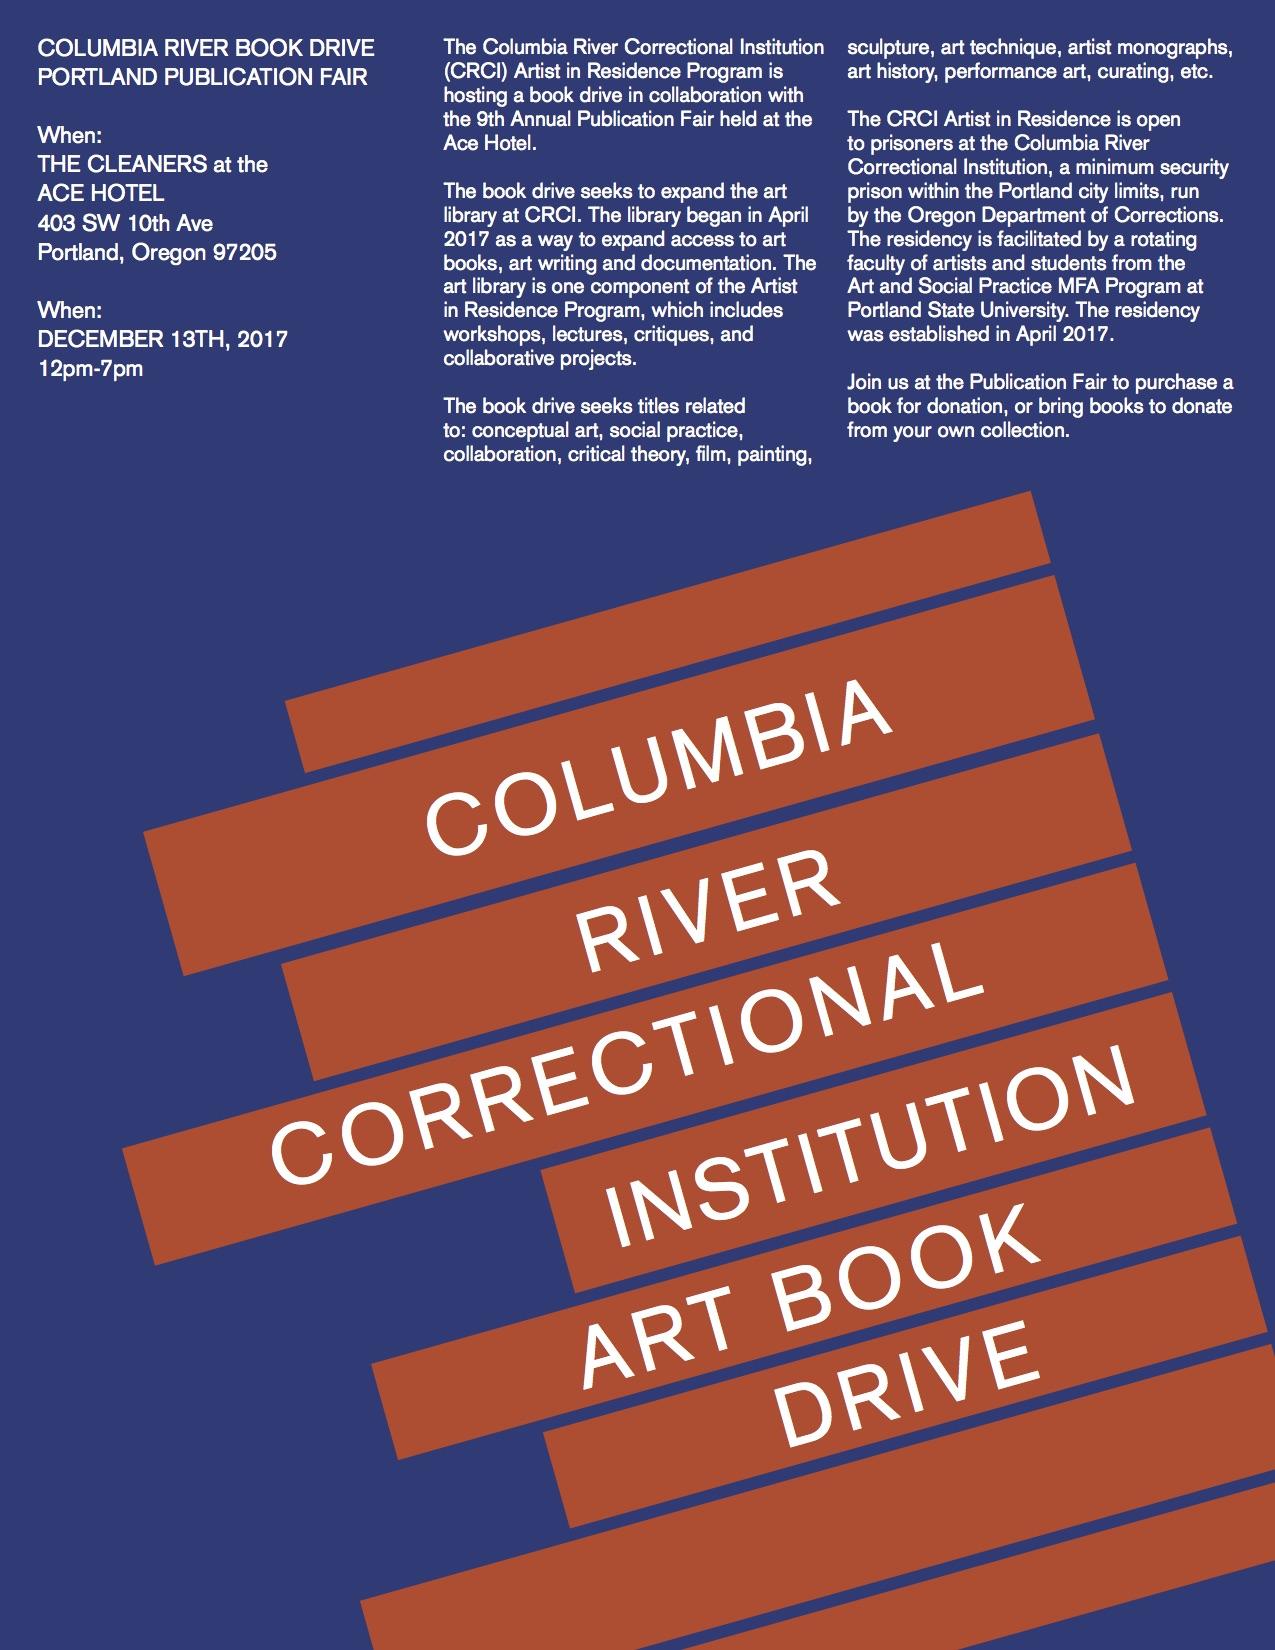 Making an Art Book Library at an Oregon Prison  sc 1 st  Prison Photography & Eye on PDX | Prison Photography